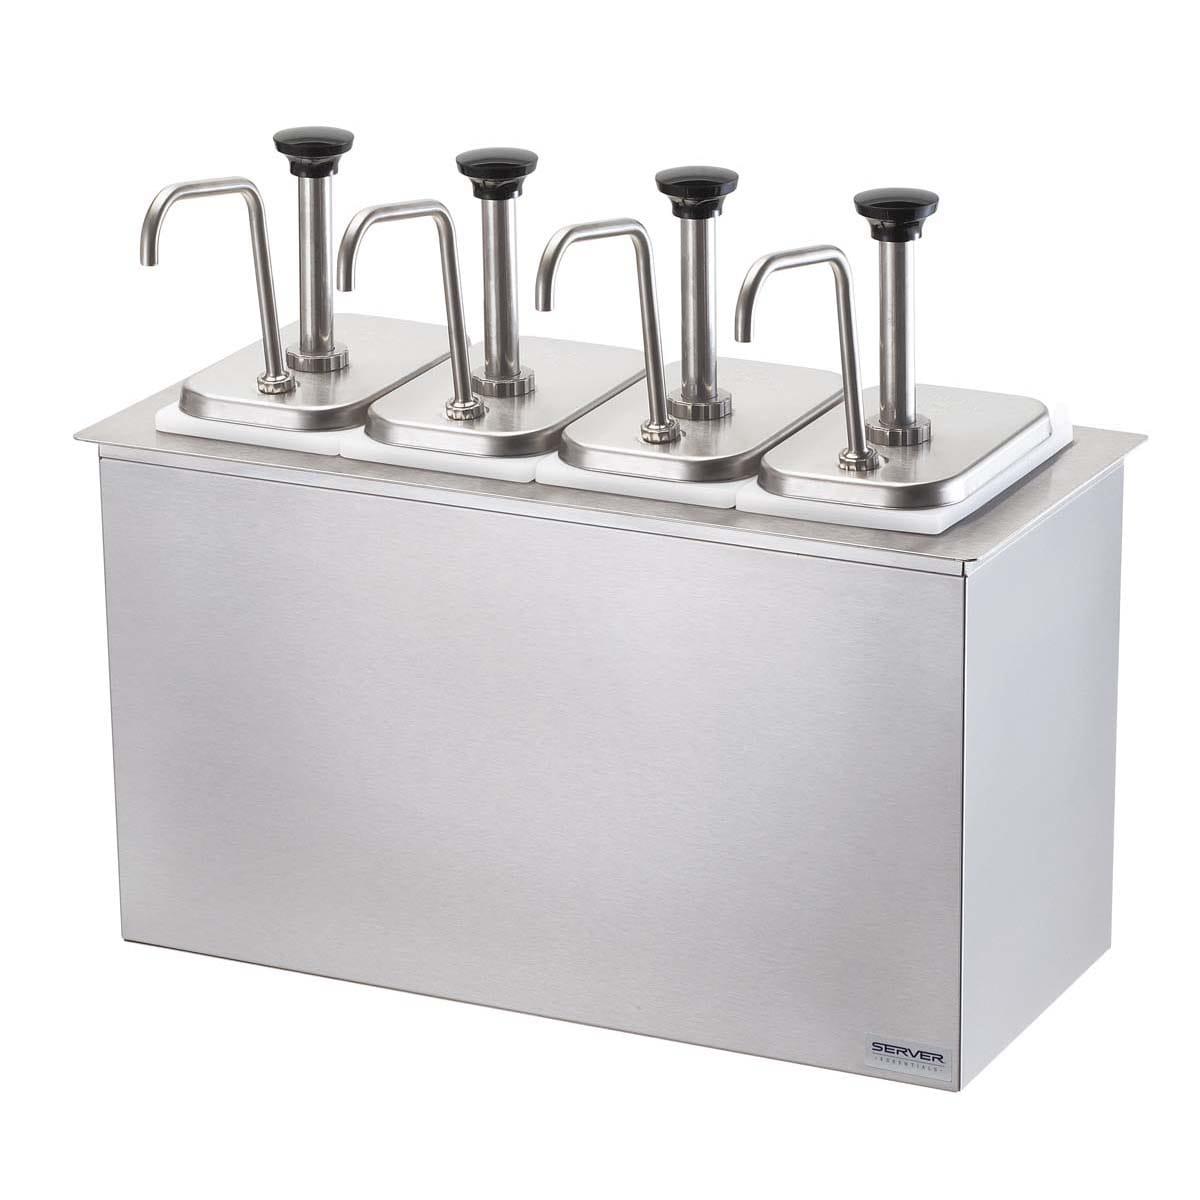 Server 83720 Pump Style Condiment Dispenser w/ (4) 1.25 oz/Stroke, Stainless